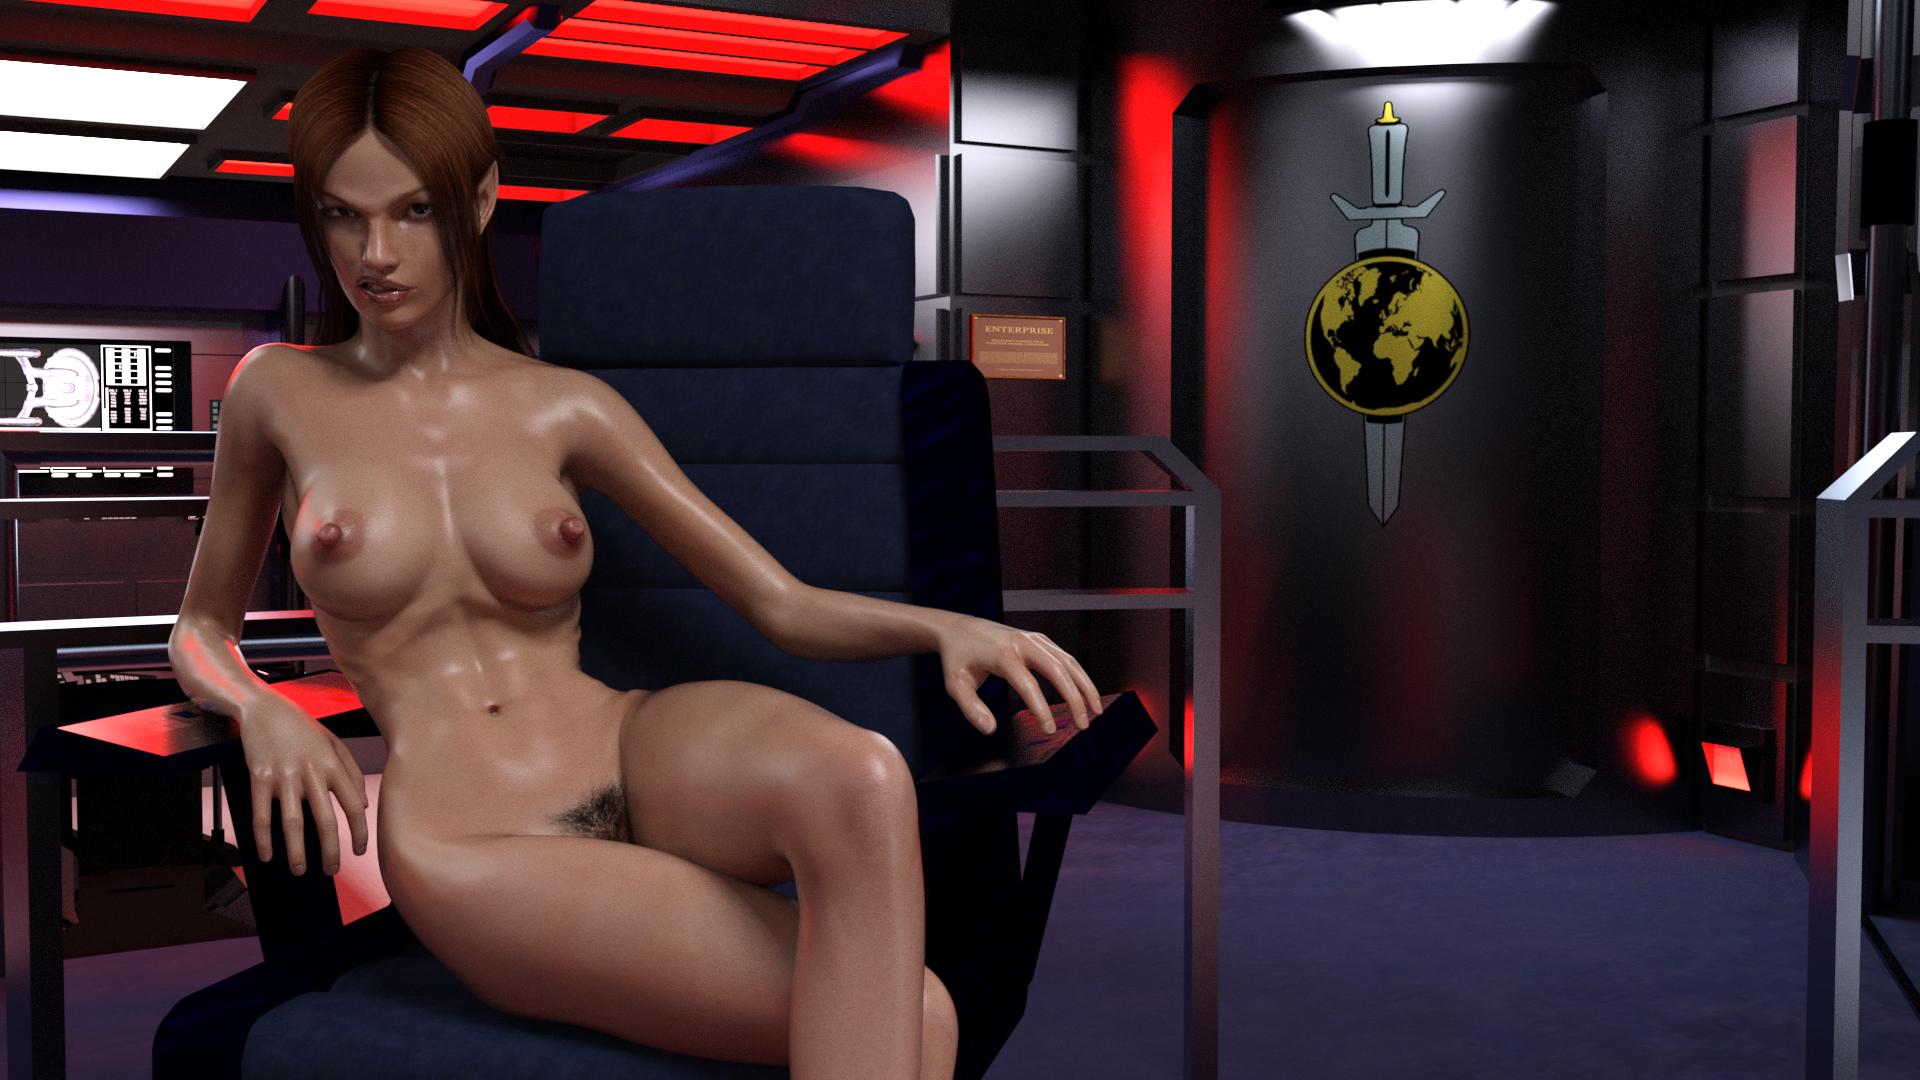 Hentai naked scenes